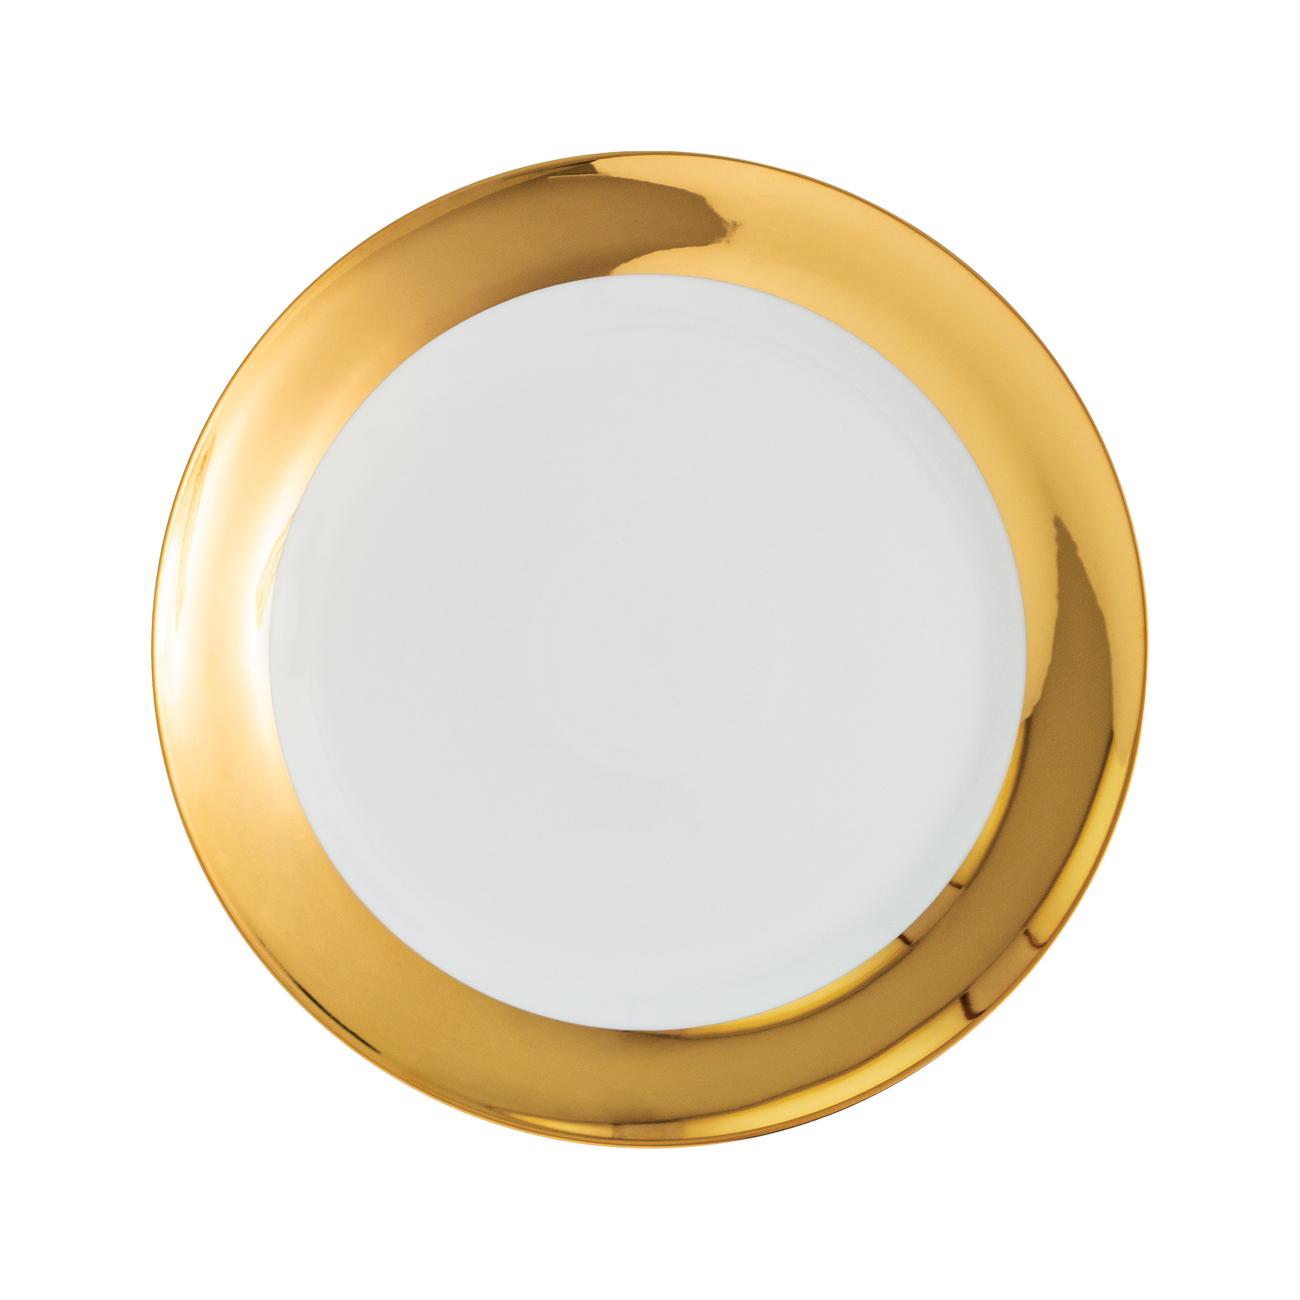 Premium Gold | Service Plate XL 32cm Viena 1